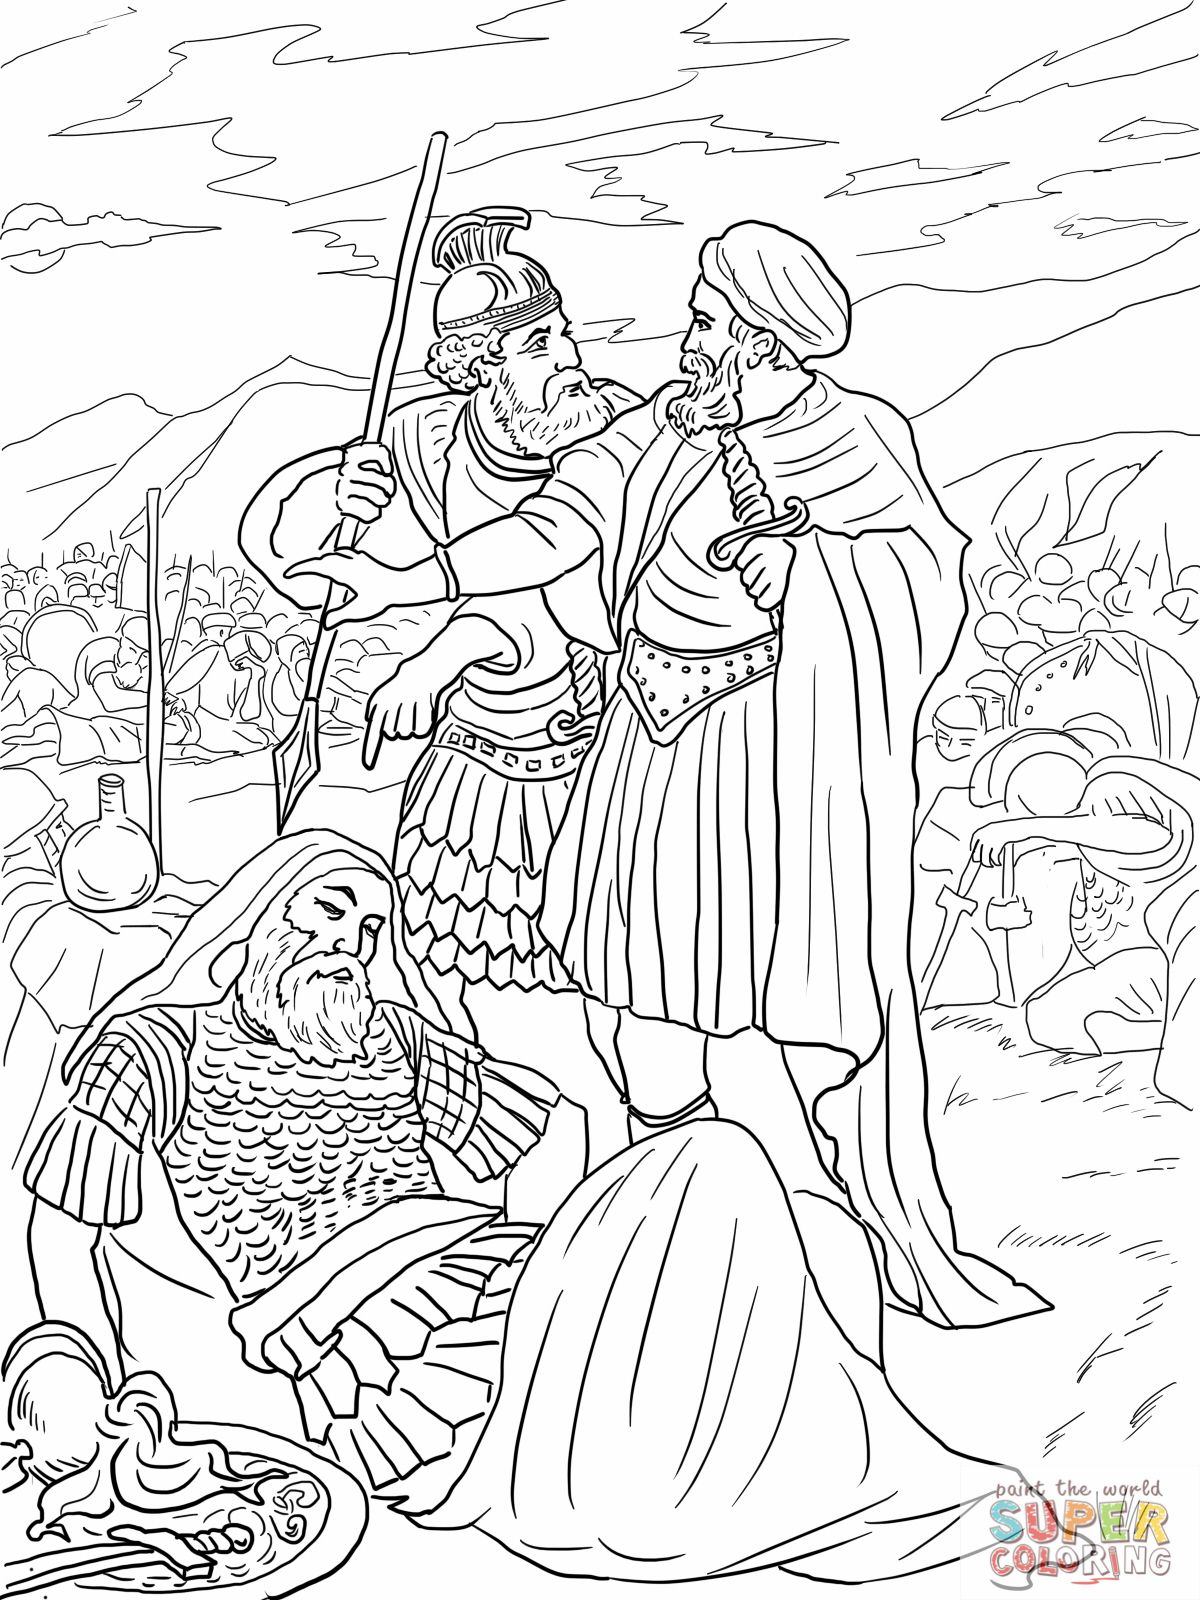 4 David Spares King Saul Coloring Page